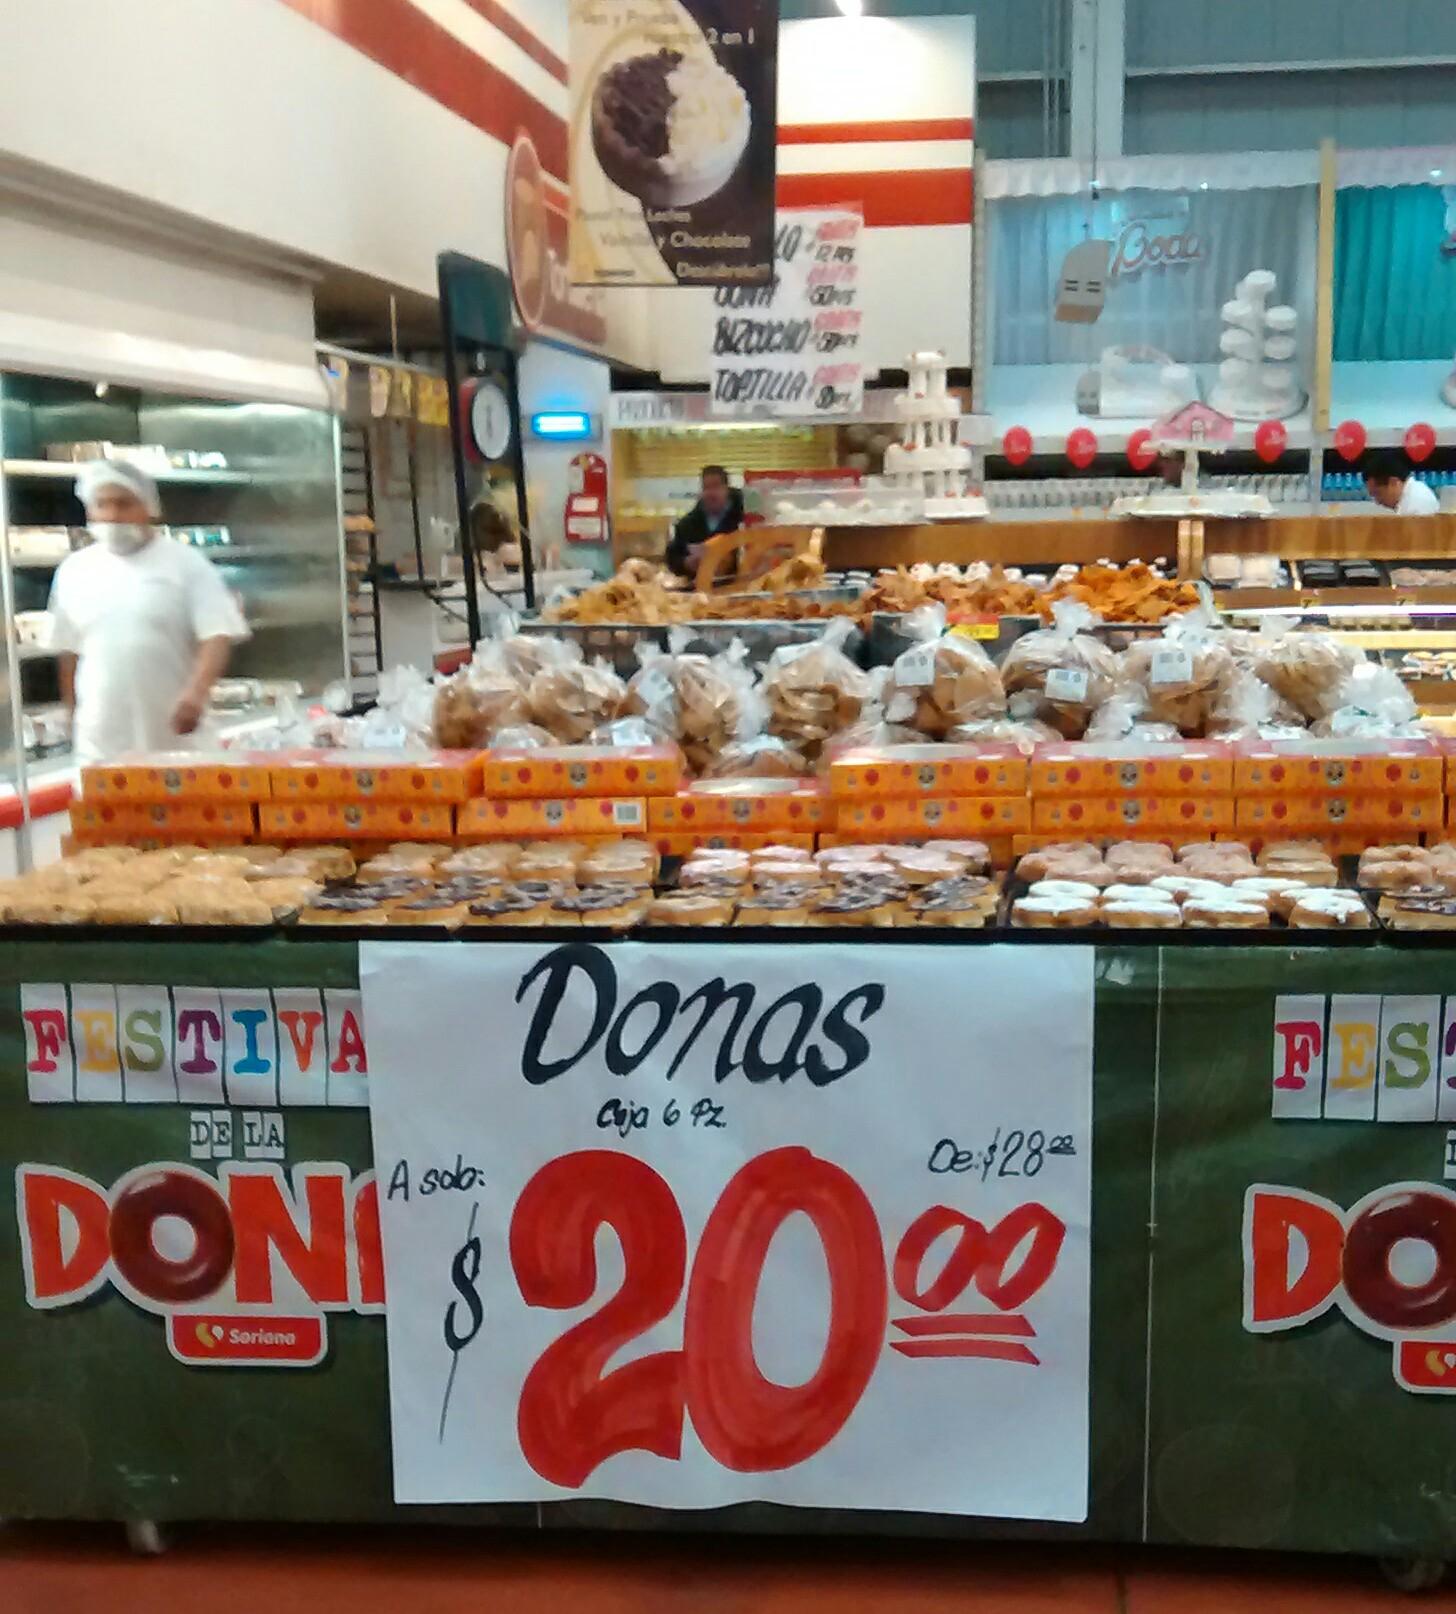 Oferta de donas en Soriana (6 por $20)